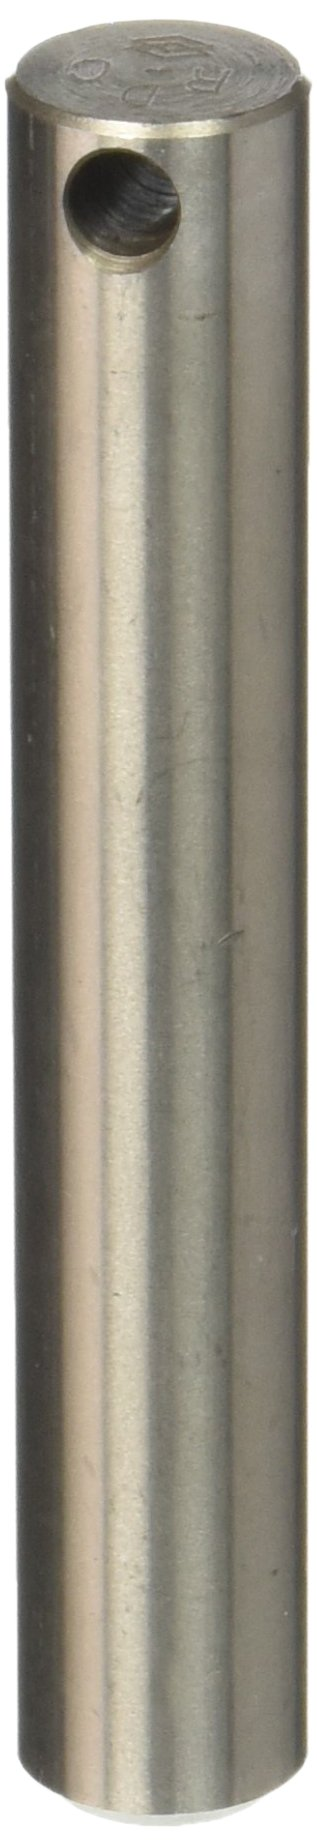 Richmond Gear CSPGM85 Mini Spool Cross Pin and Shaft